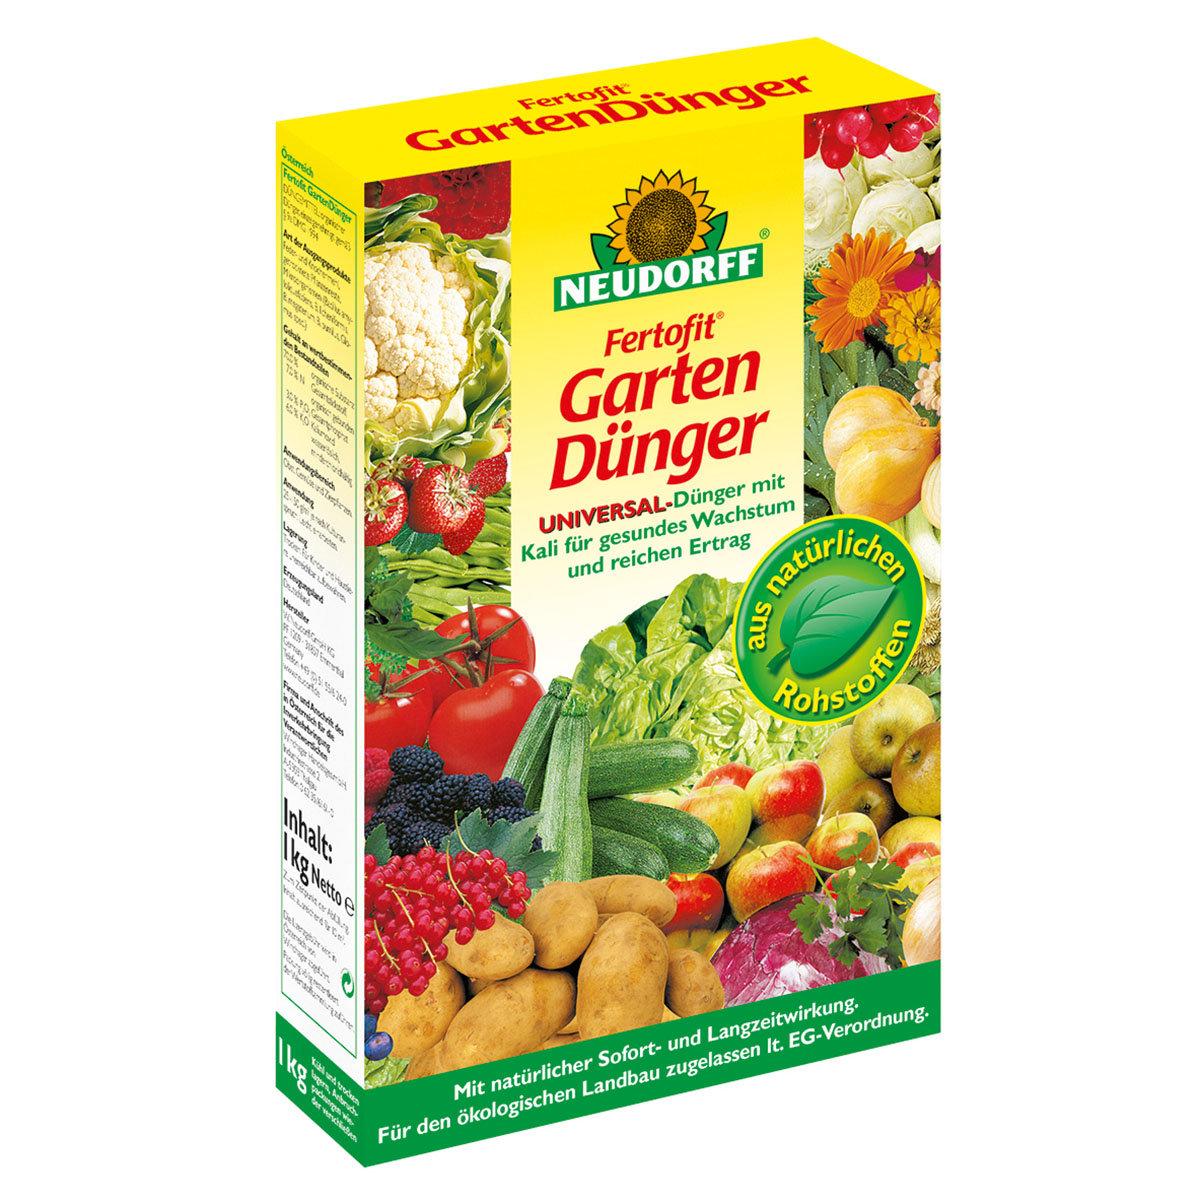 Neudorff Fertofit GartenDünger, 2,5 kg